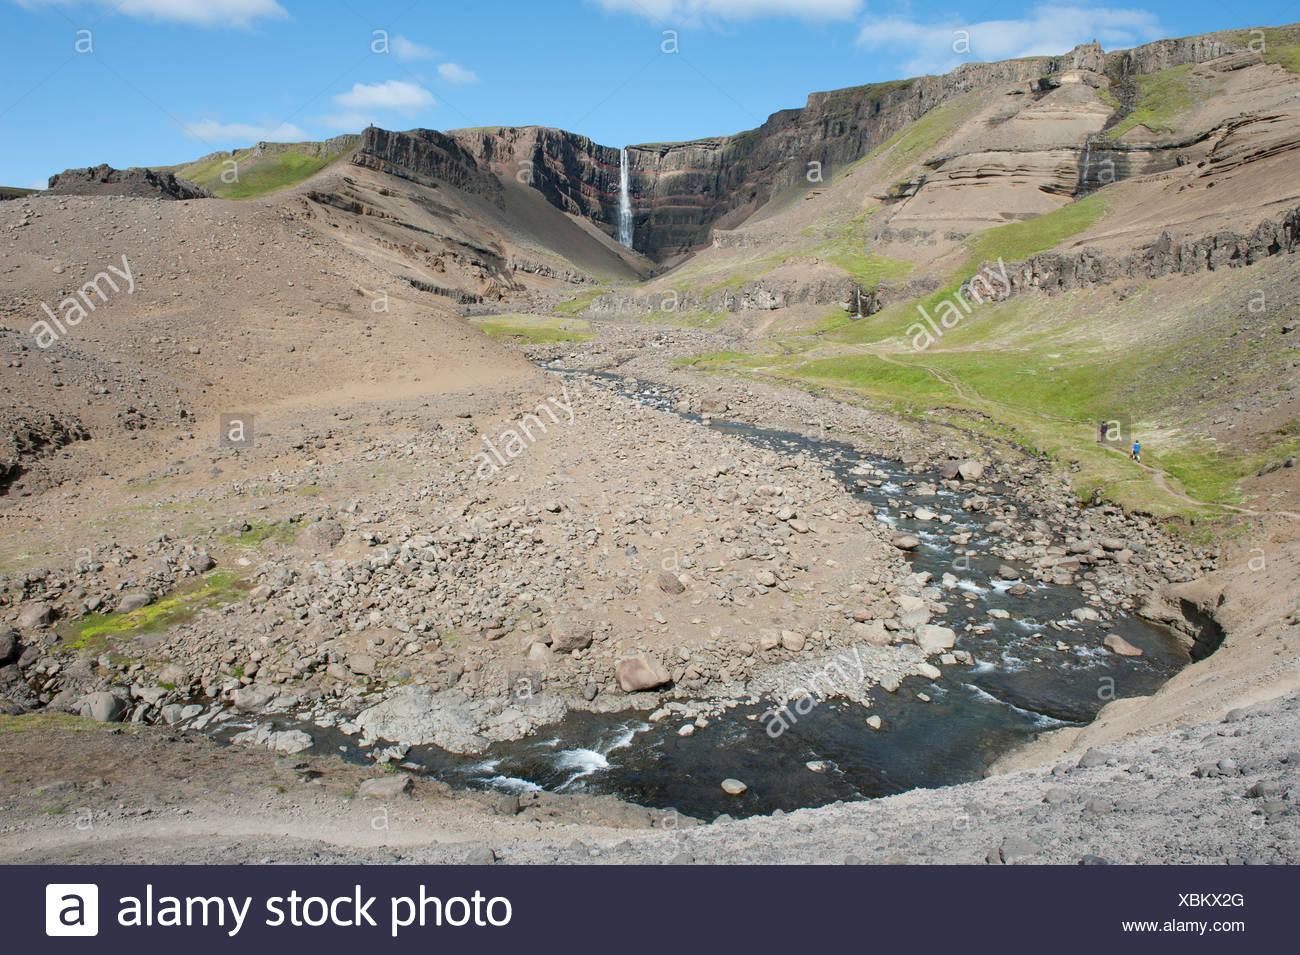 Zerklüftete Landschaft, Stream, Hengifoss Wasserfall in der Nähe von Egilsstaðir, Island, Skandinavien, Nordeuropa, Europa Stockbild